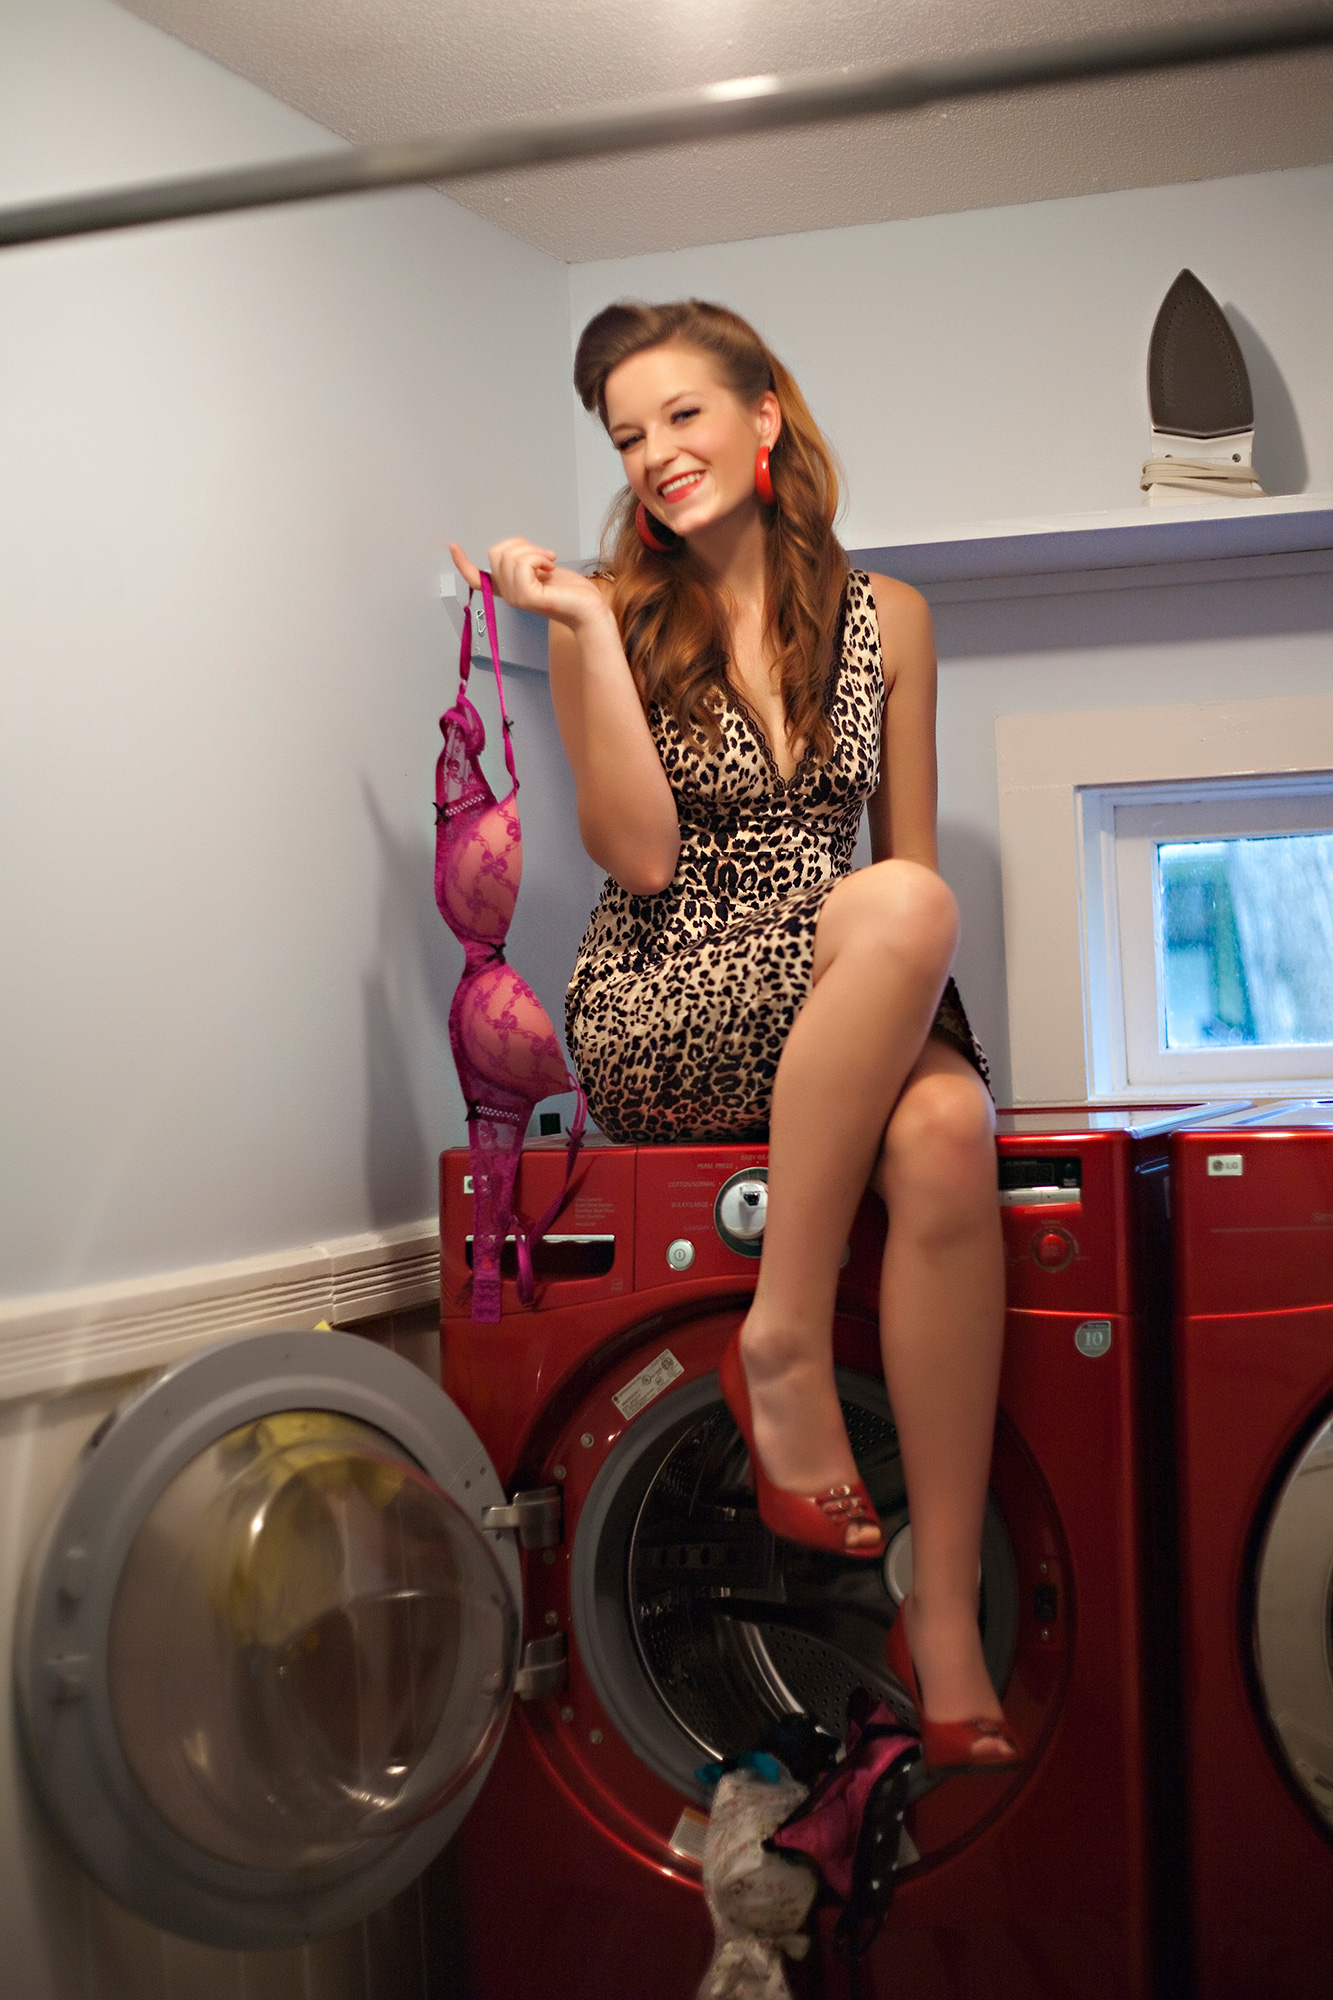 lavish boudoir albuquerque pinup samsung washer